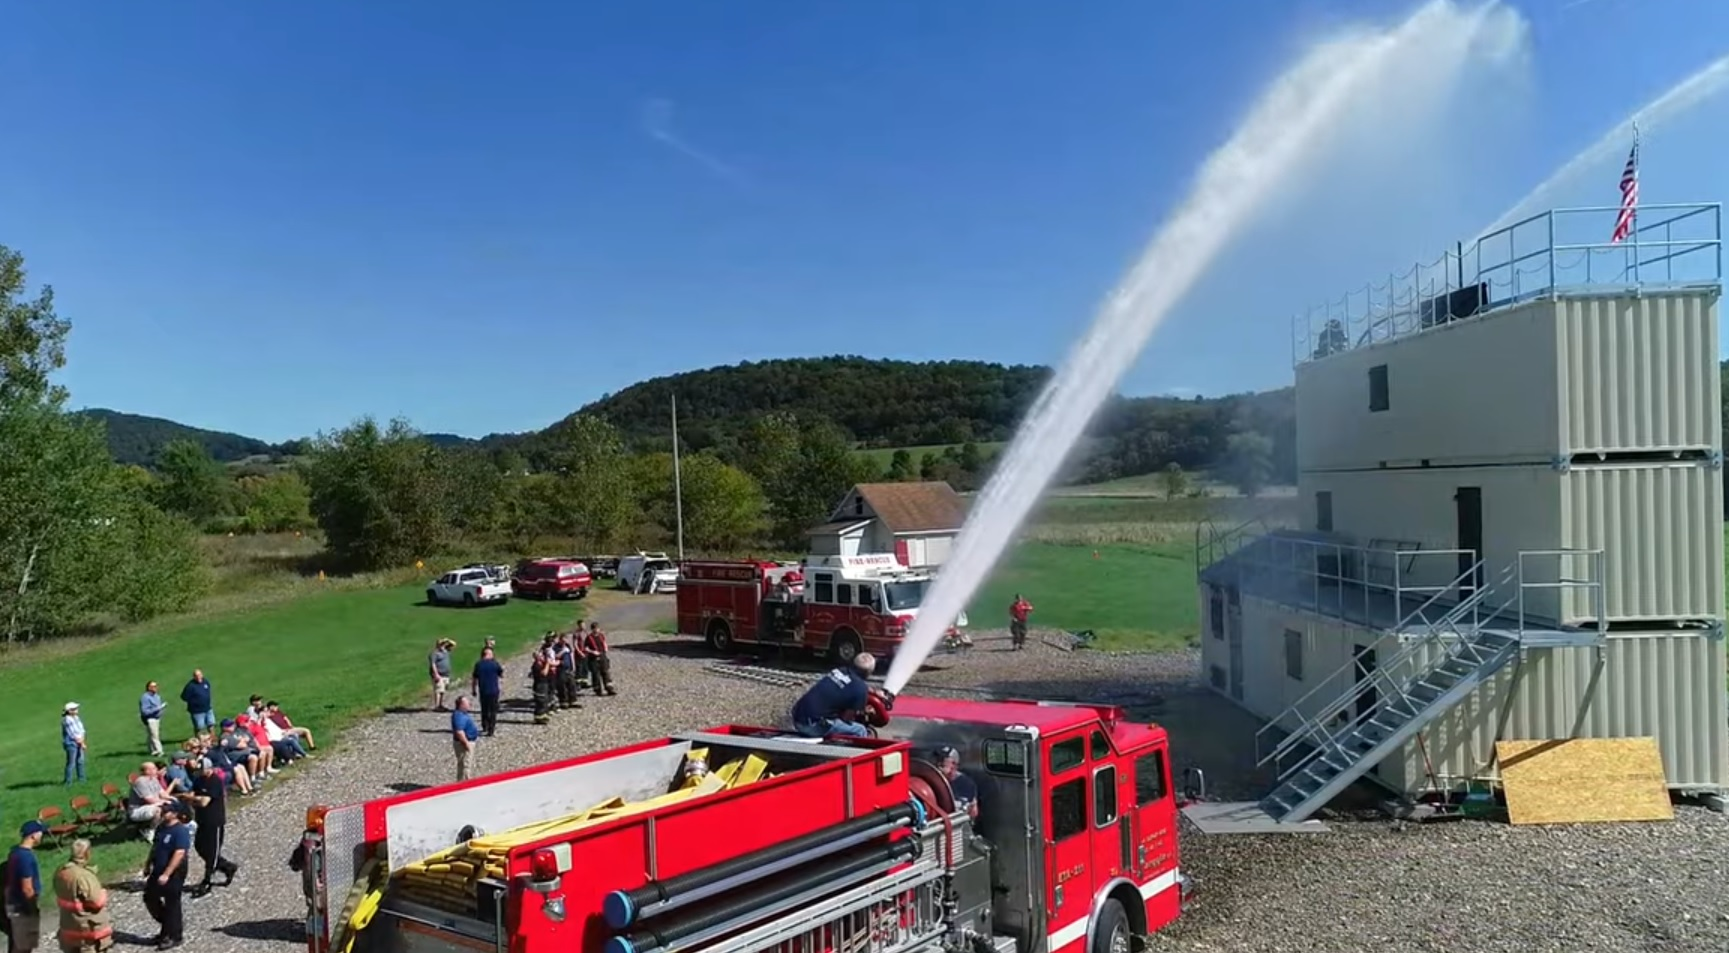 fort edward argyle firefighter training building